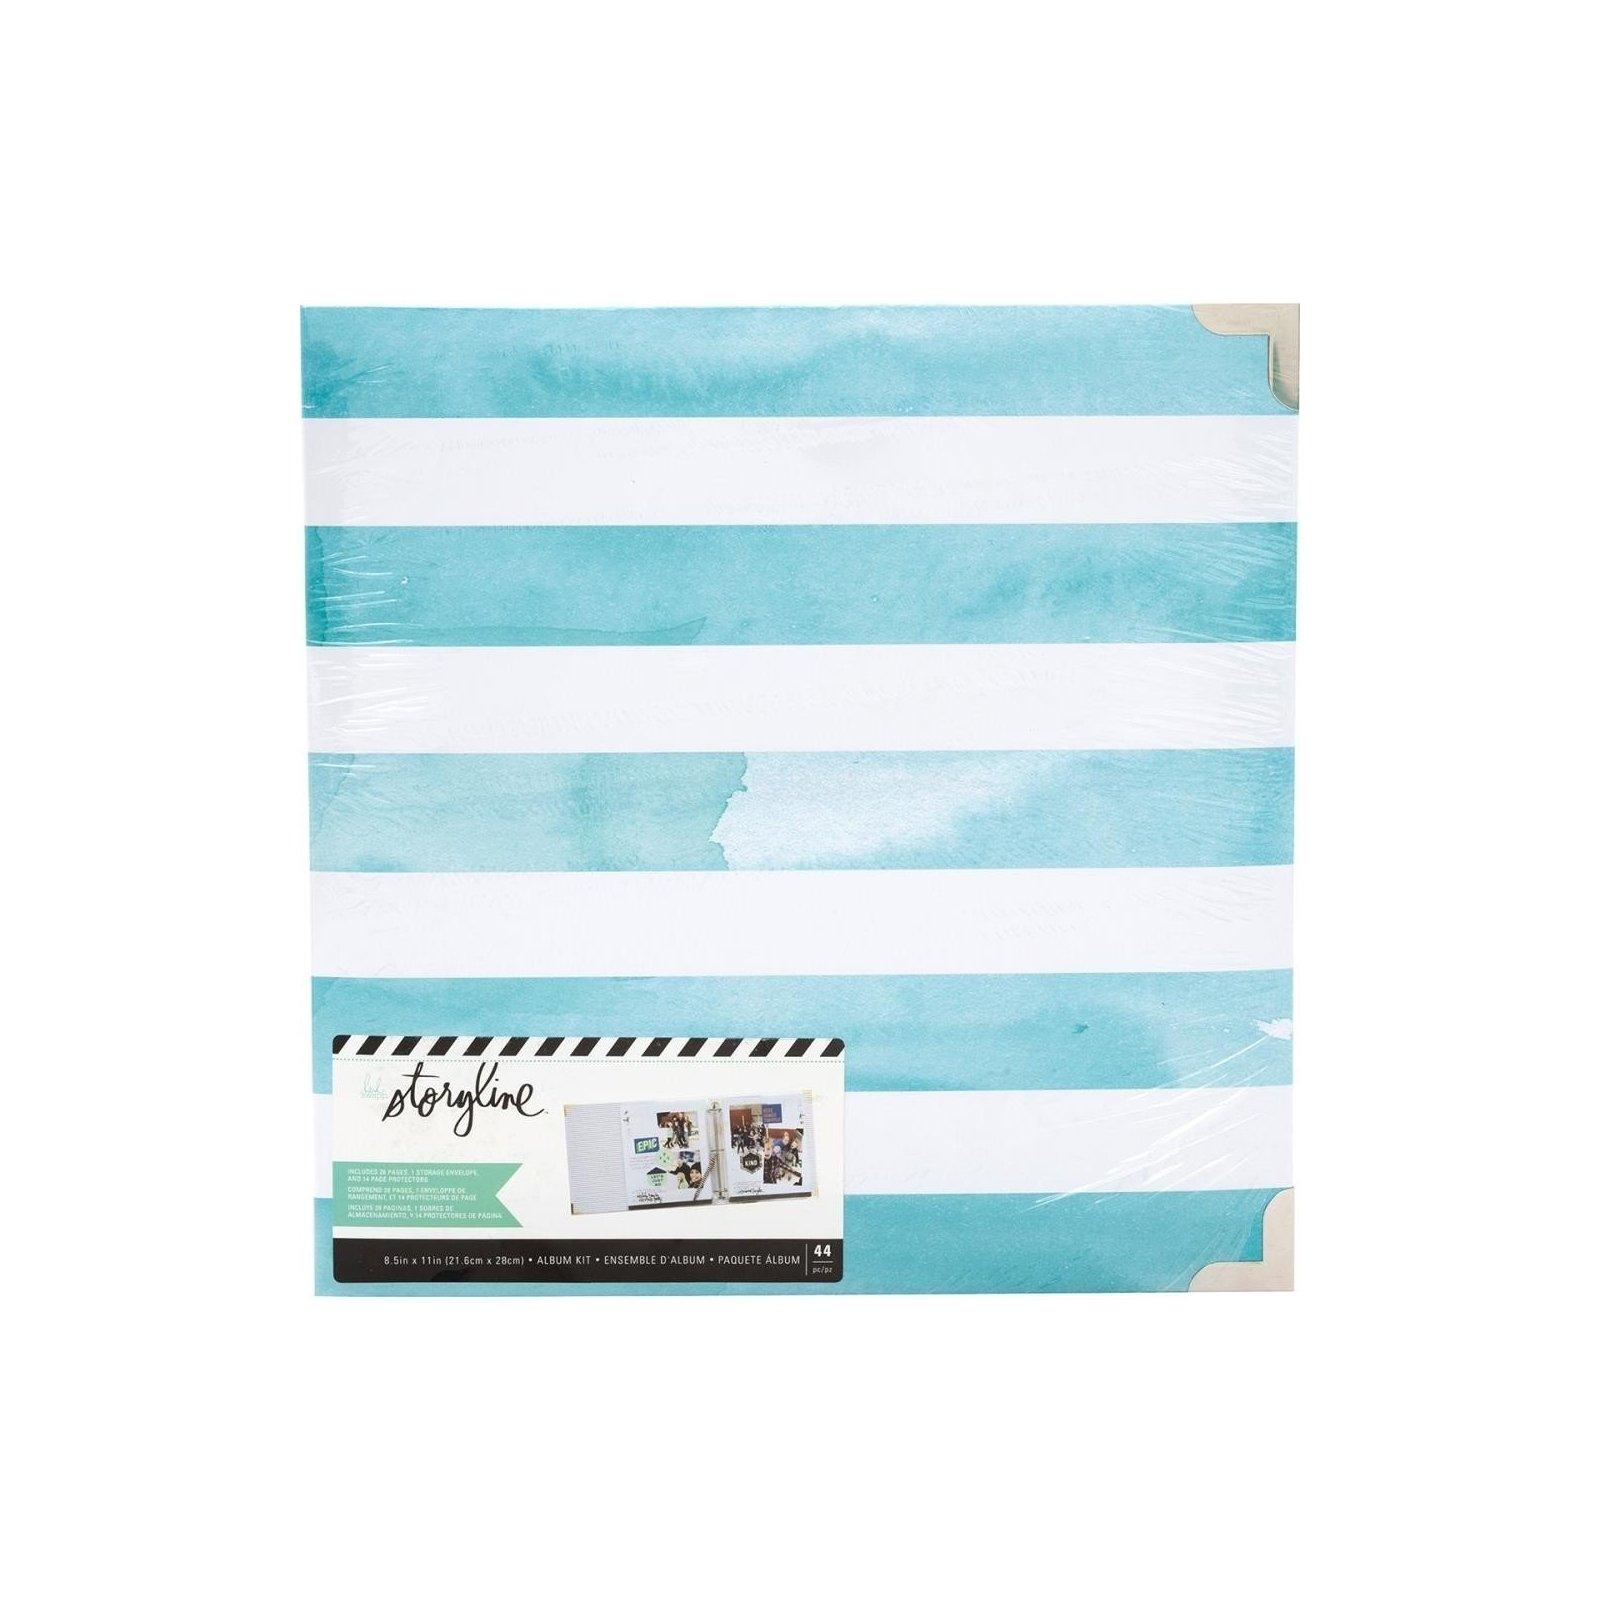 Album Watercolor Stripe - A4 américain - Storyline - Heidi Swapp